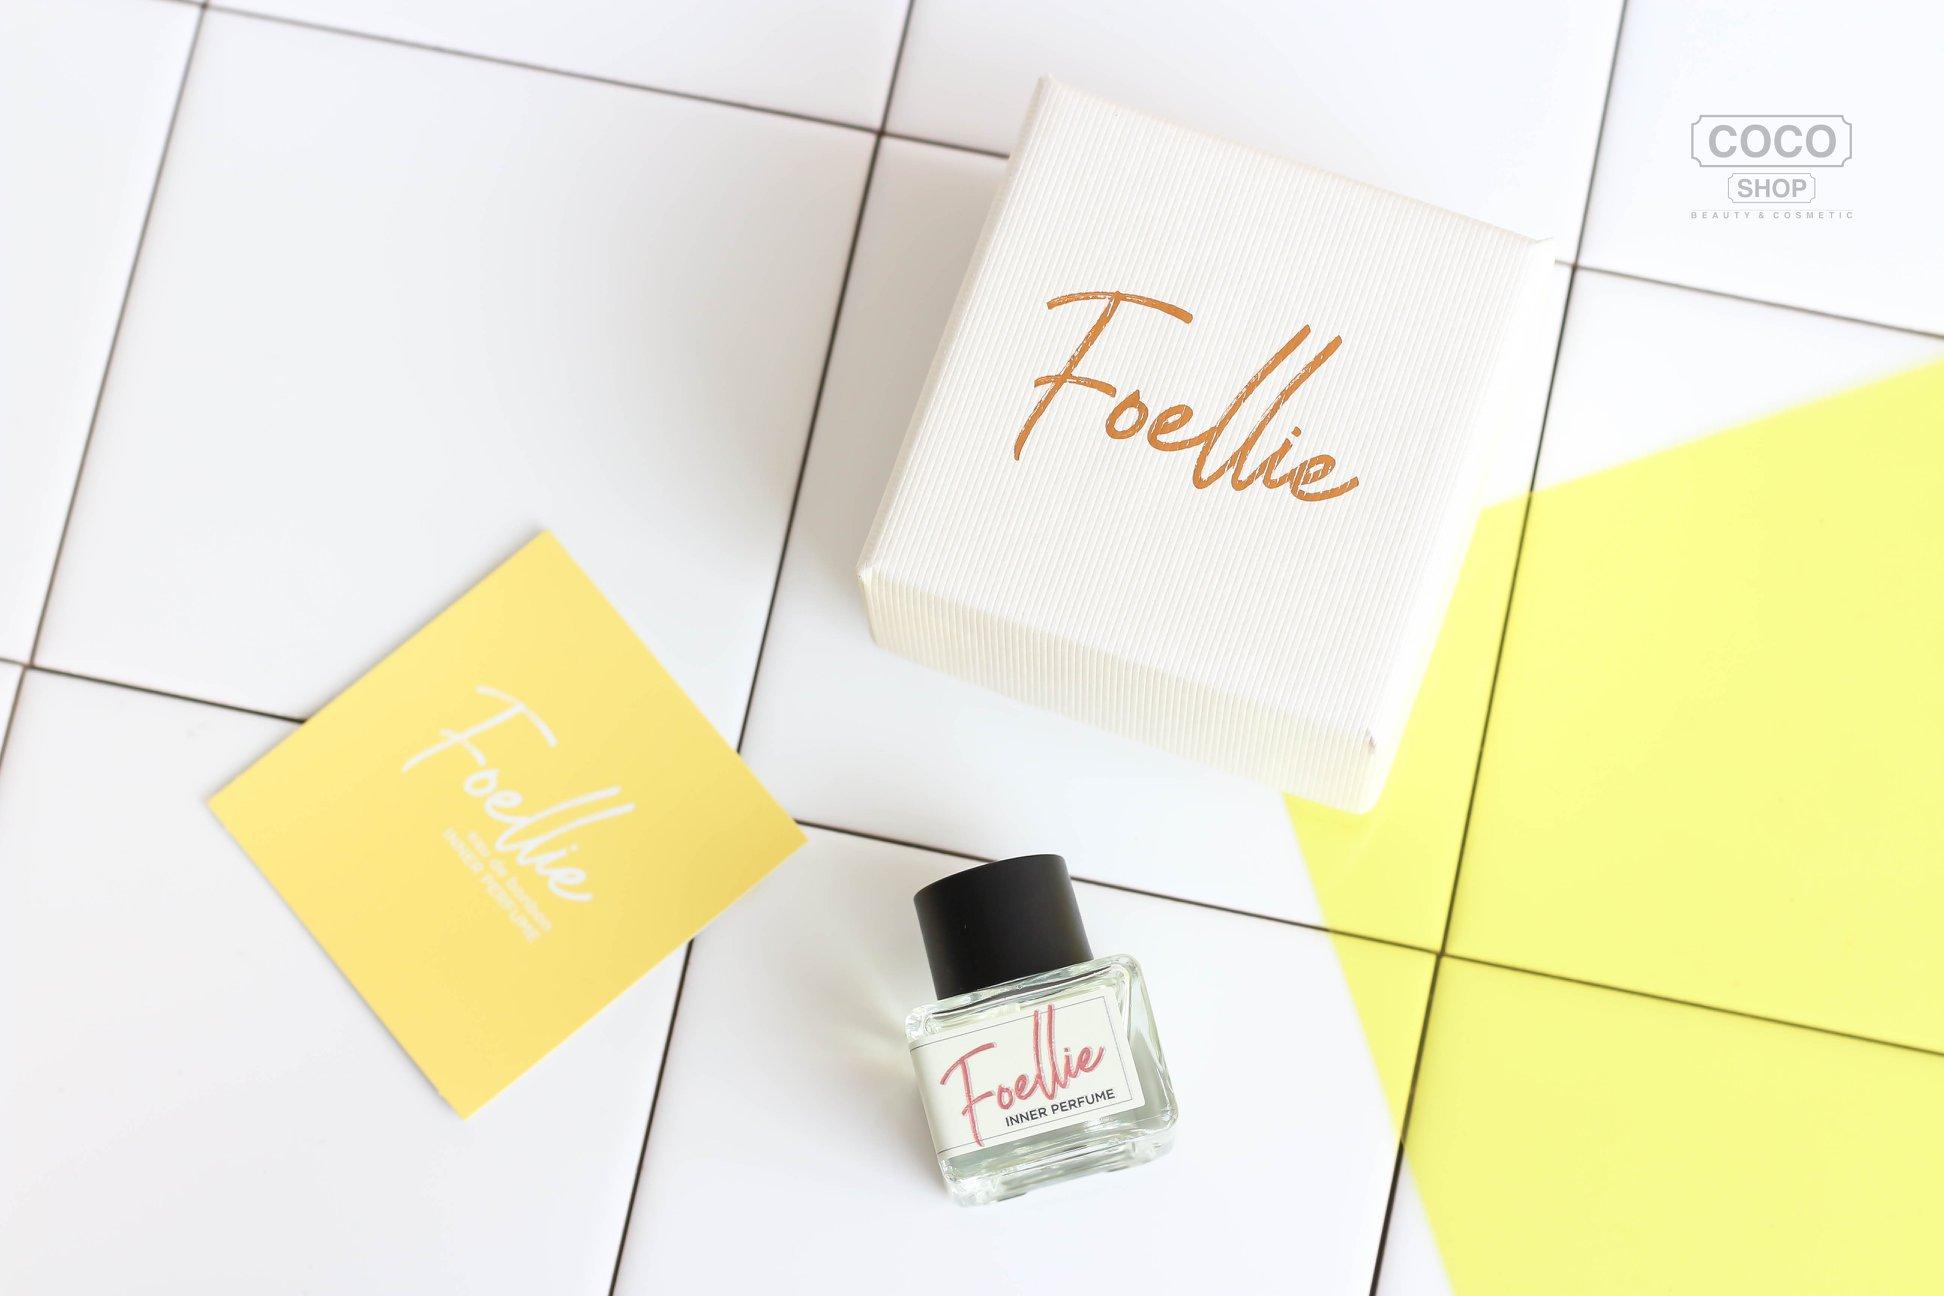 Nước hoa vùng kín Foellie 2